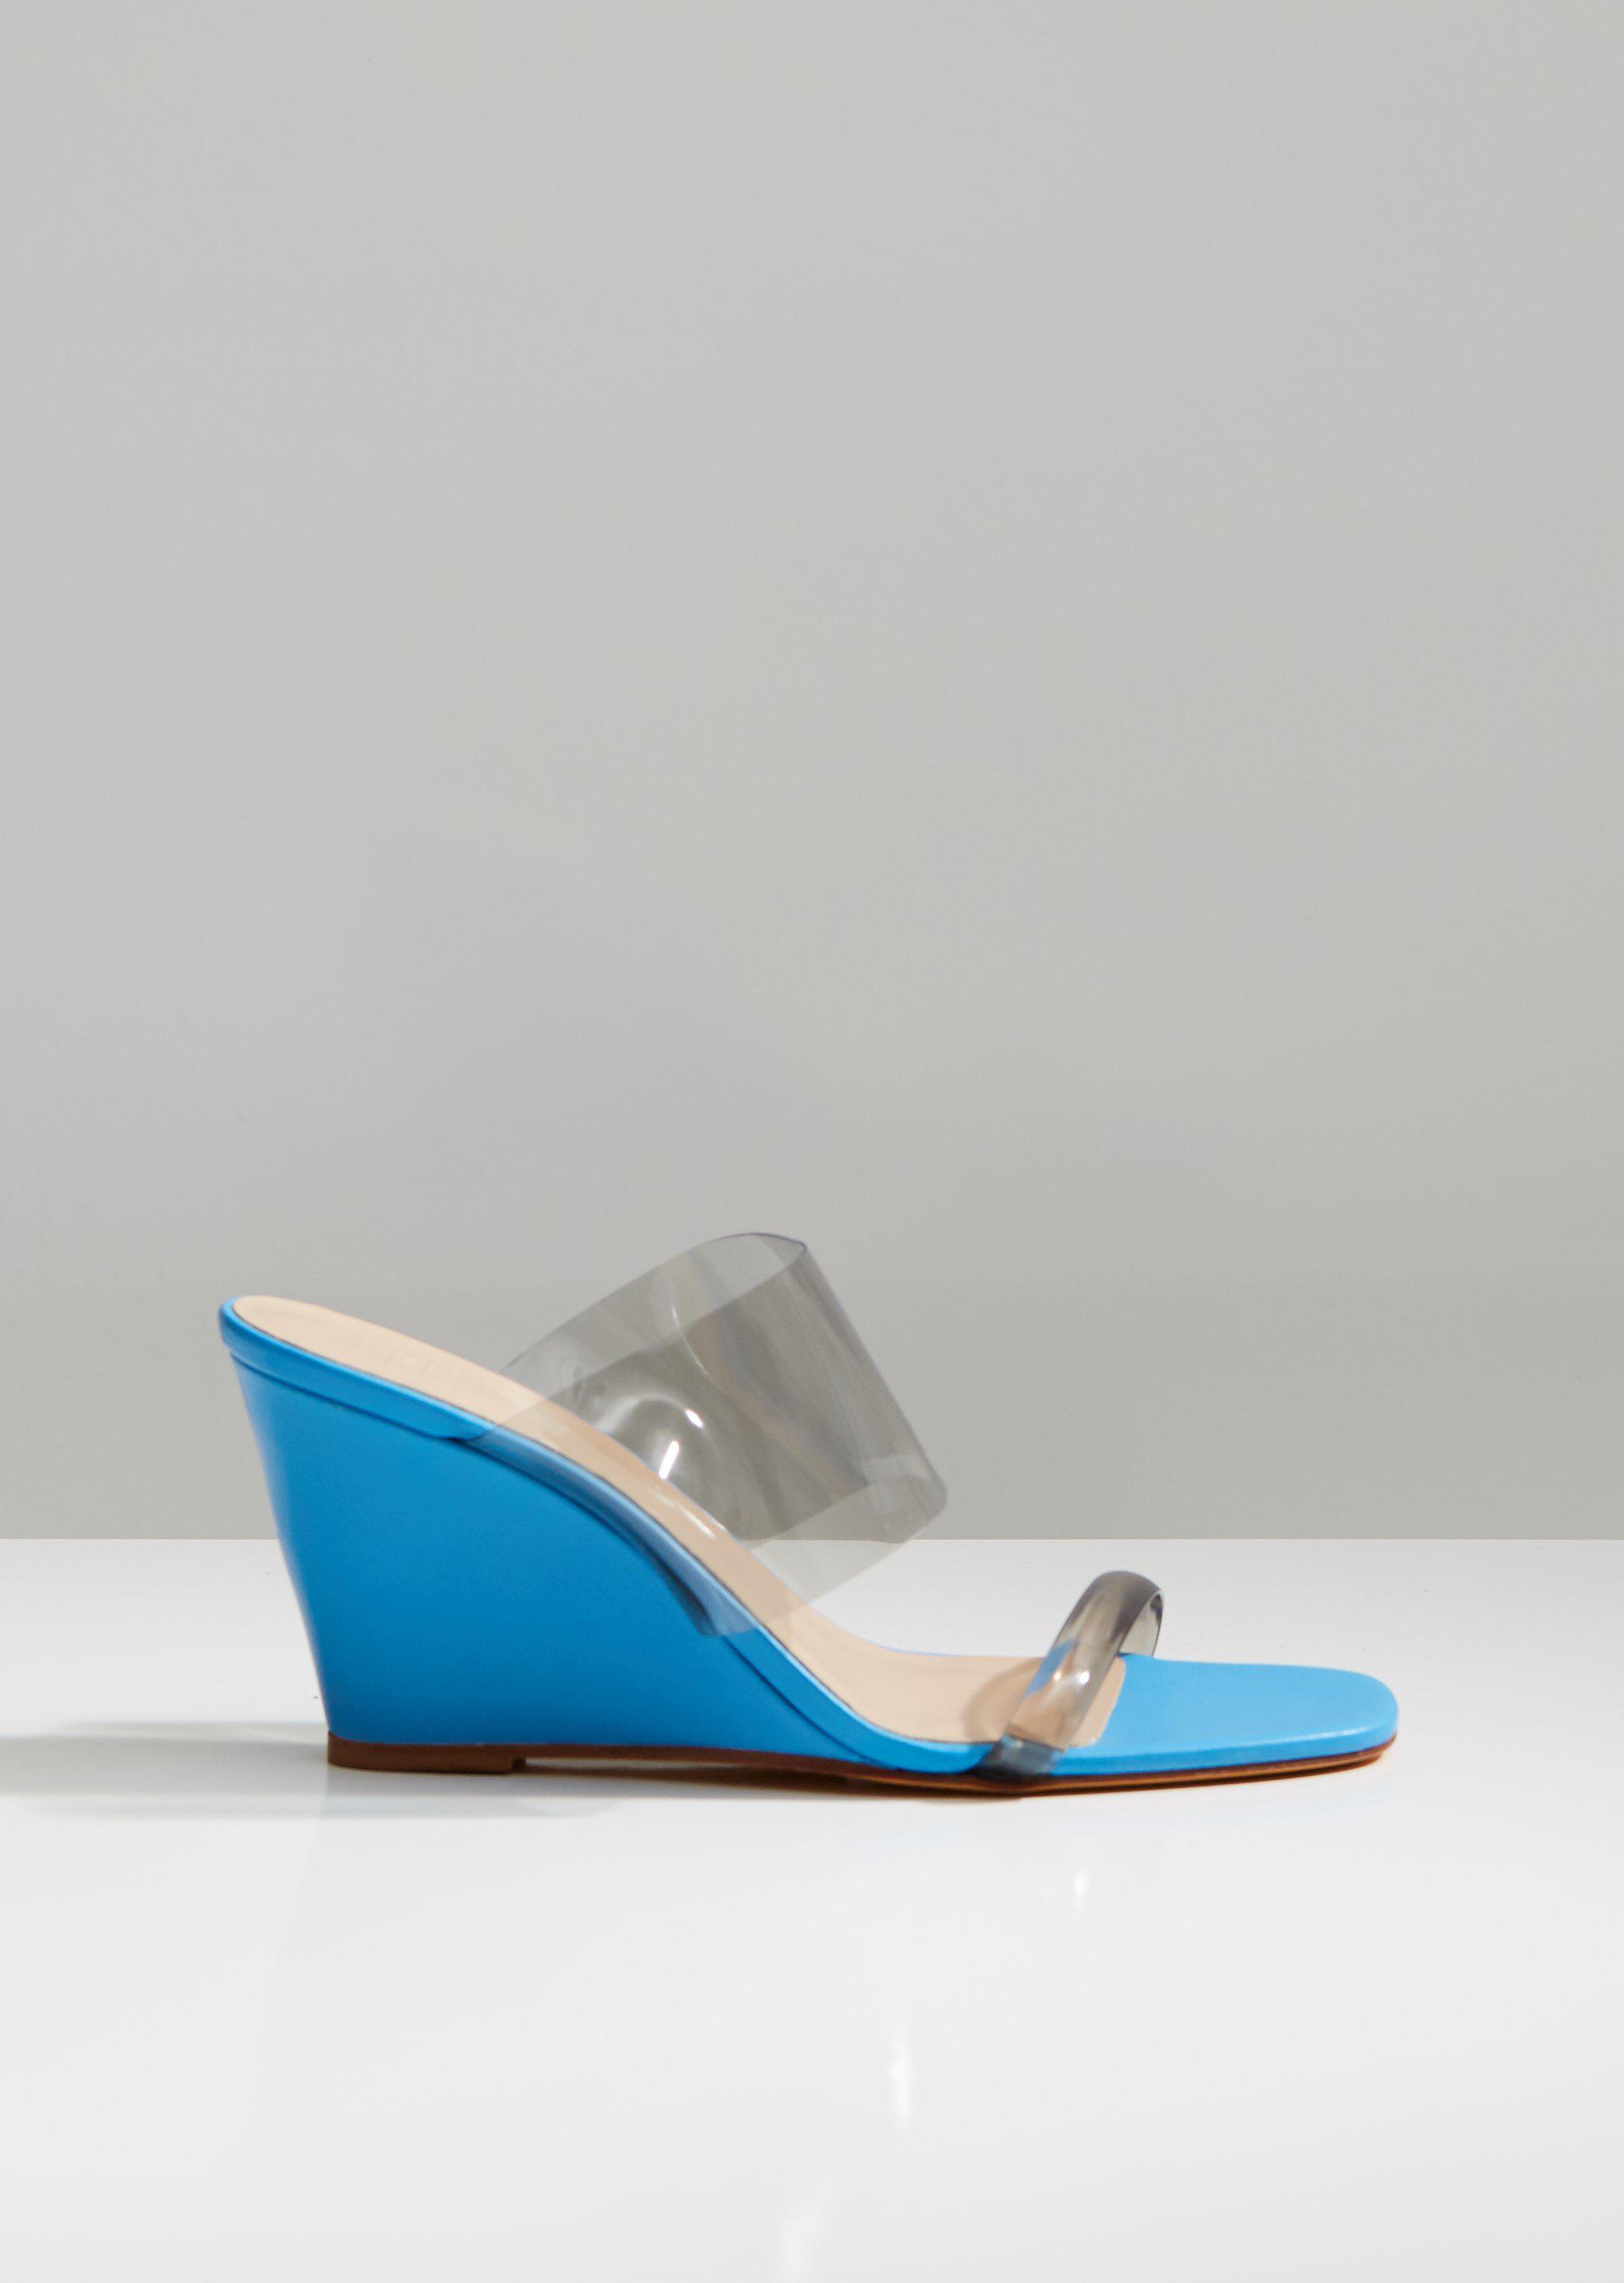 5d1c900d849 Maryam Nassir Zadeh. Women s Blue Olympia Wedge Heels.  452 From La Garçonne